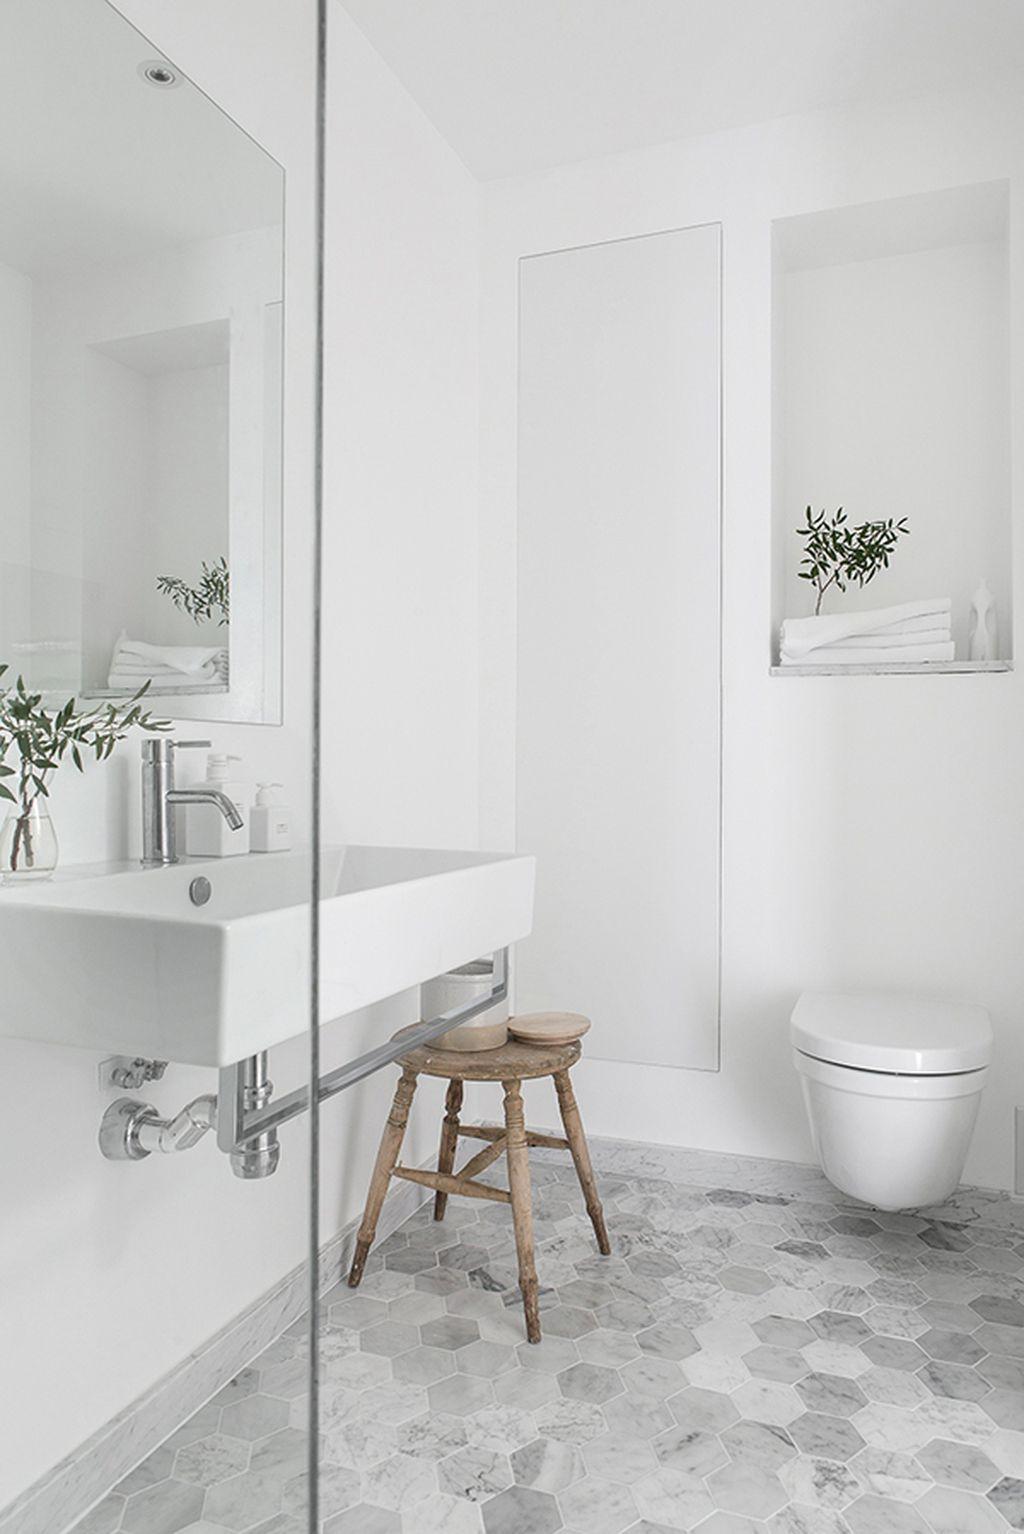 Awesome 67 Fantastic Minimalist White Bathroom Remodel Ideas  Https://decoralink.com/